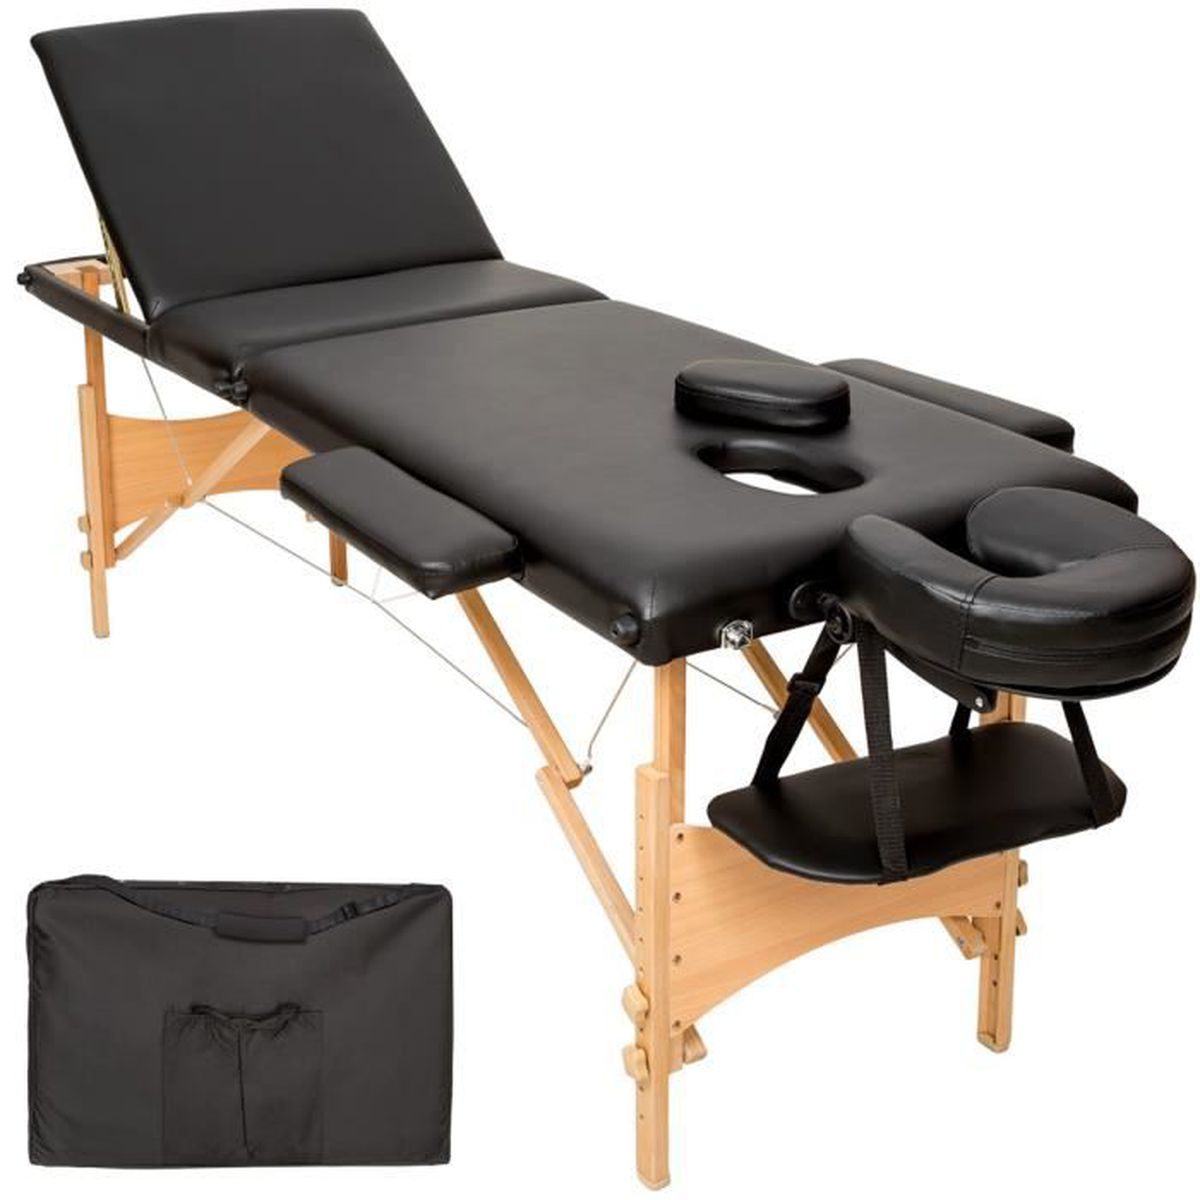 Table de massage TECTAKE Table de Massage Pliante en Bois Portable